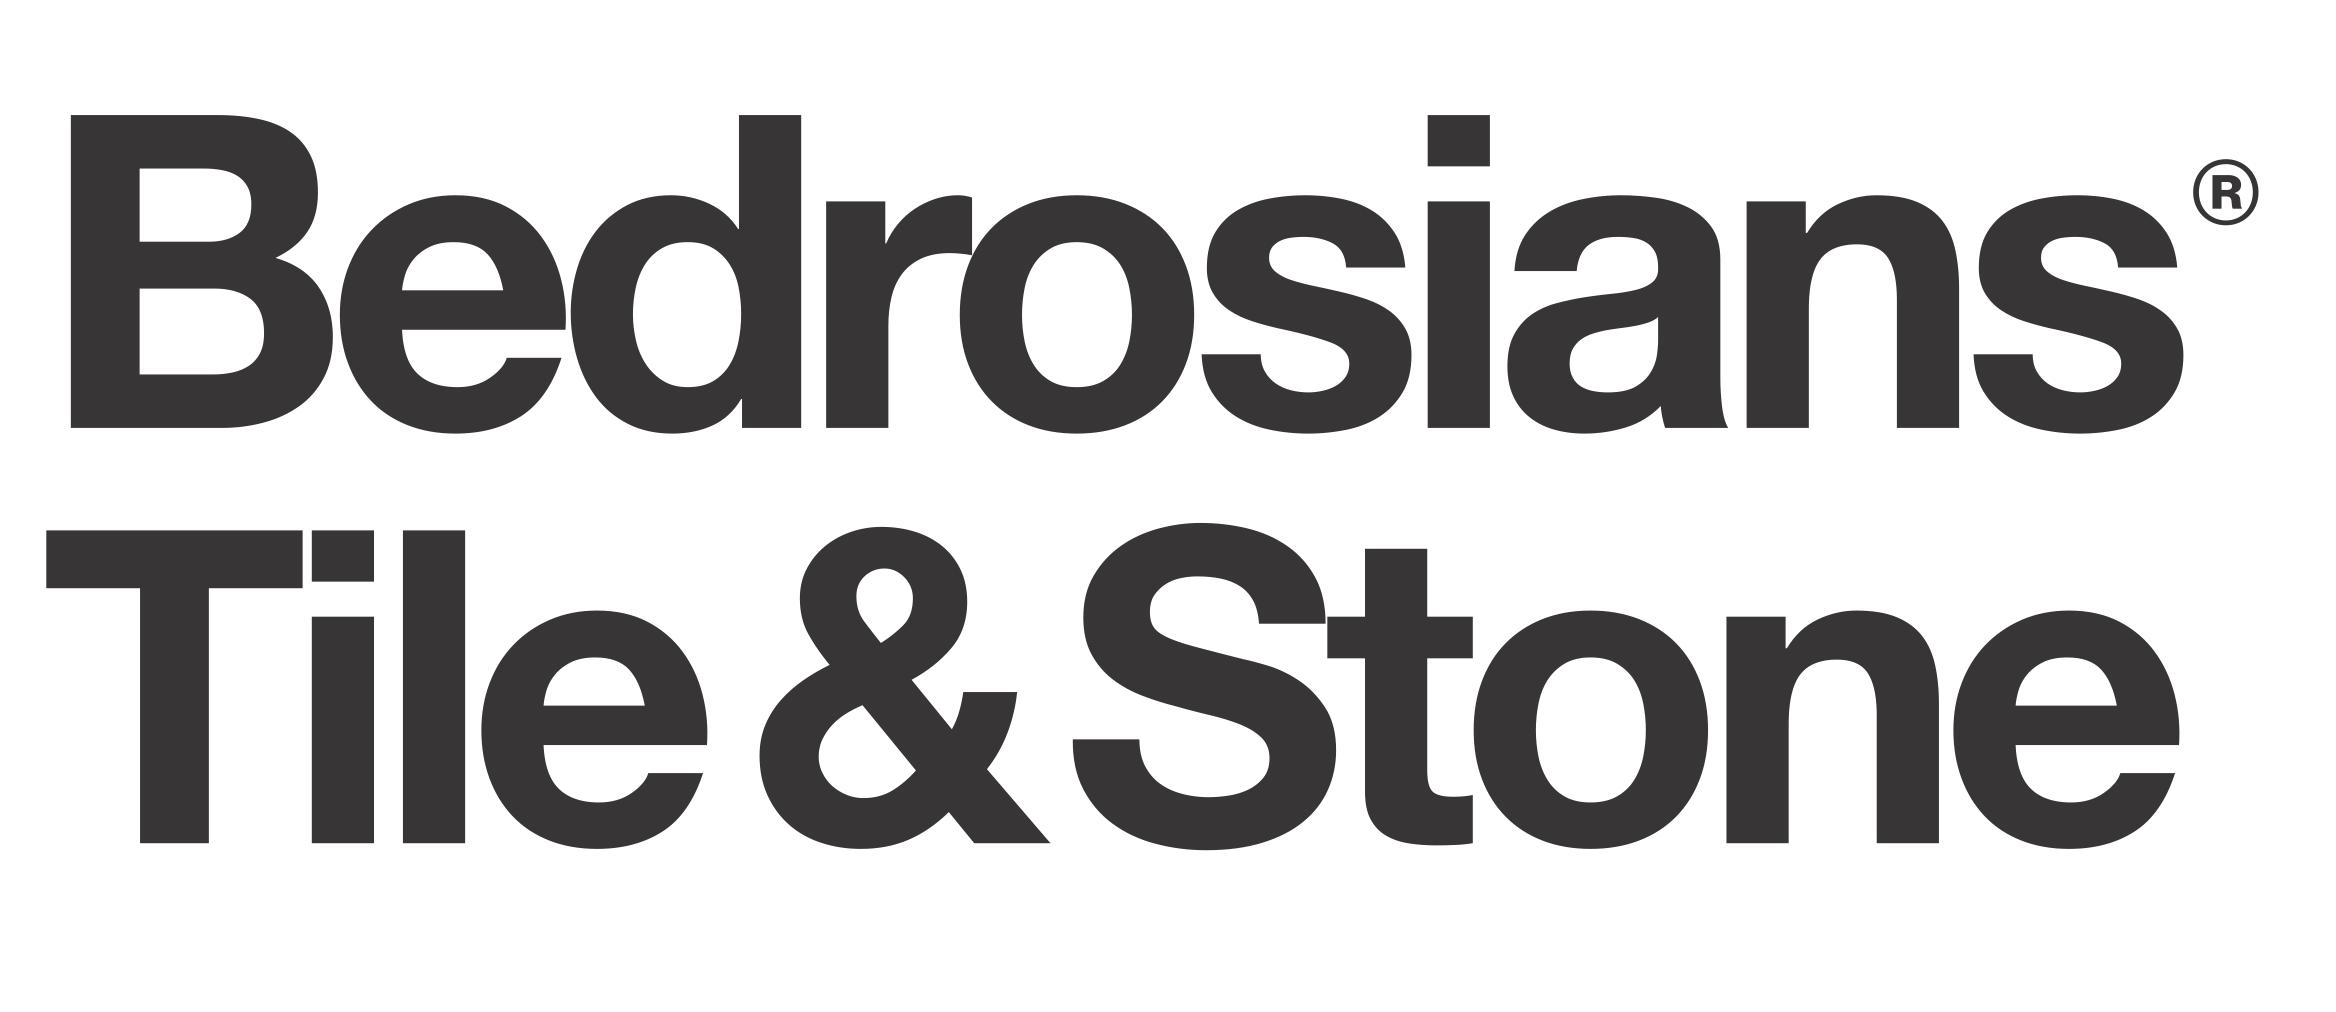 Bedrosians Tile & Stone coupon codes